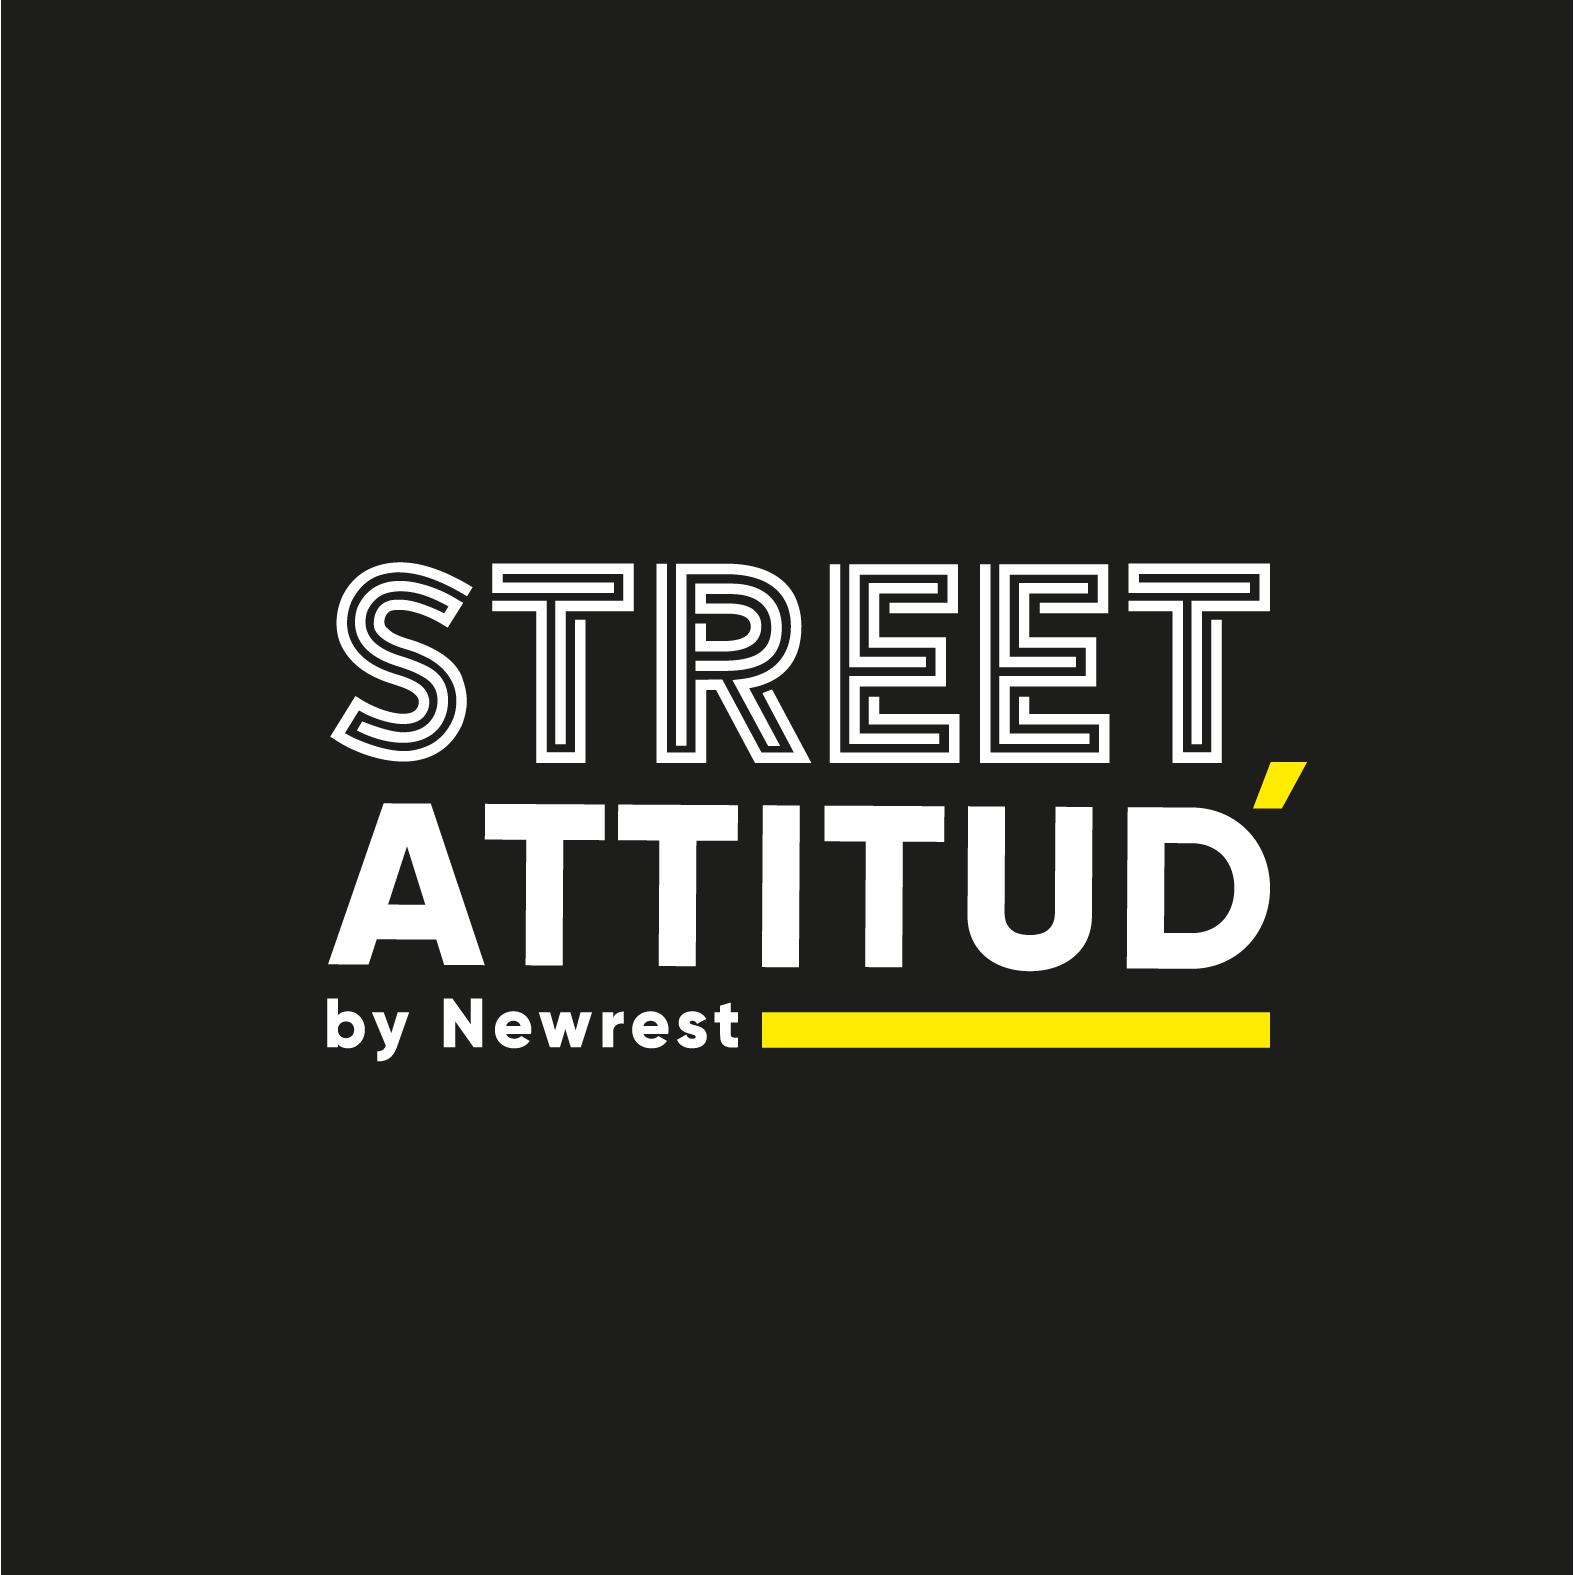 Street Attitud'